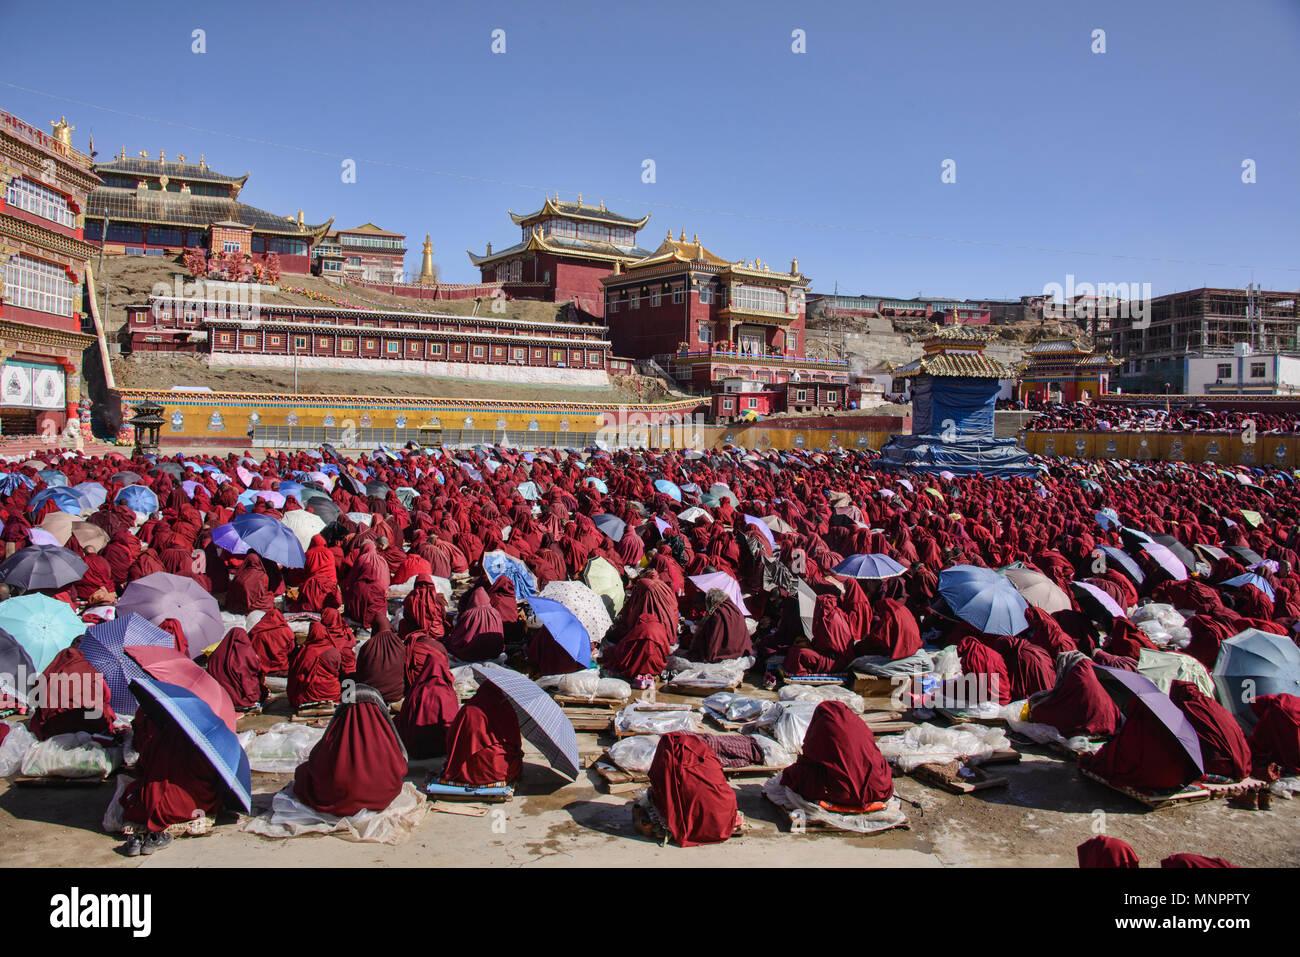 Masses of Tibetan monks and nuns at lama teachings, Yarchen Gar, Sichuan, China - Stock Image